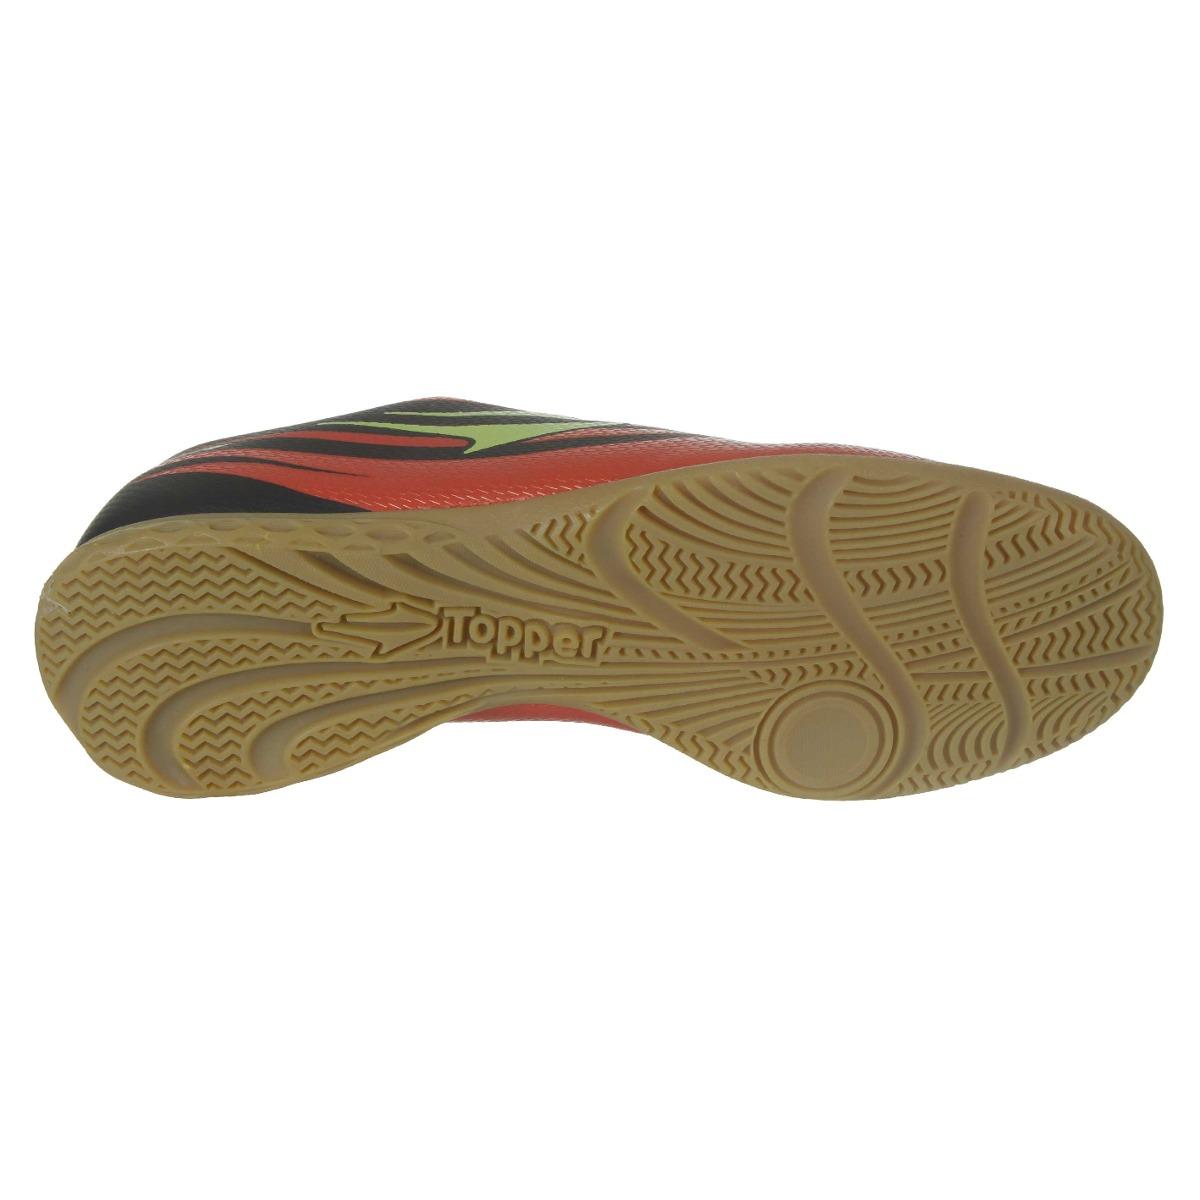 1f34c803cd8ae Chuteira Futsal Topper Rapina 3 Masculino - R$ 149,90 em Mercado Livre